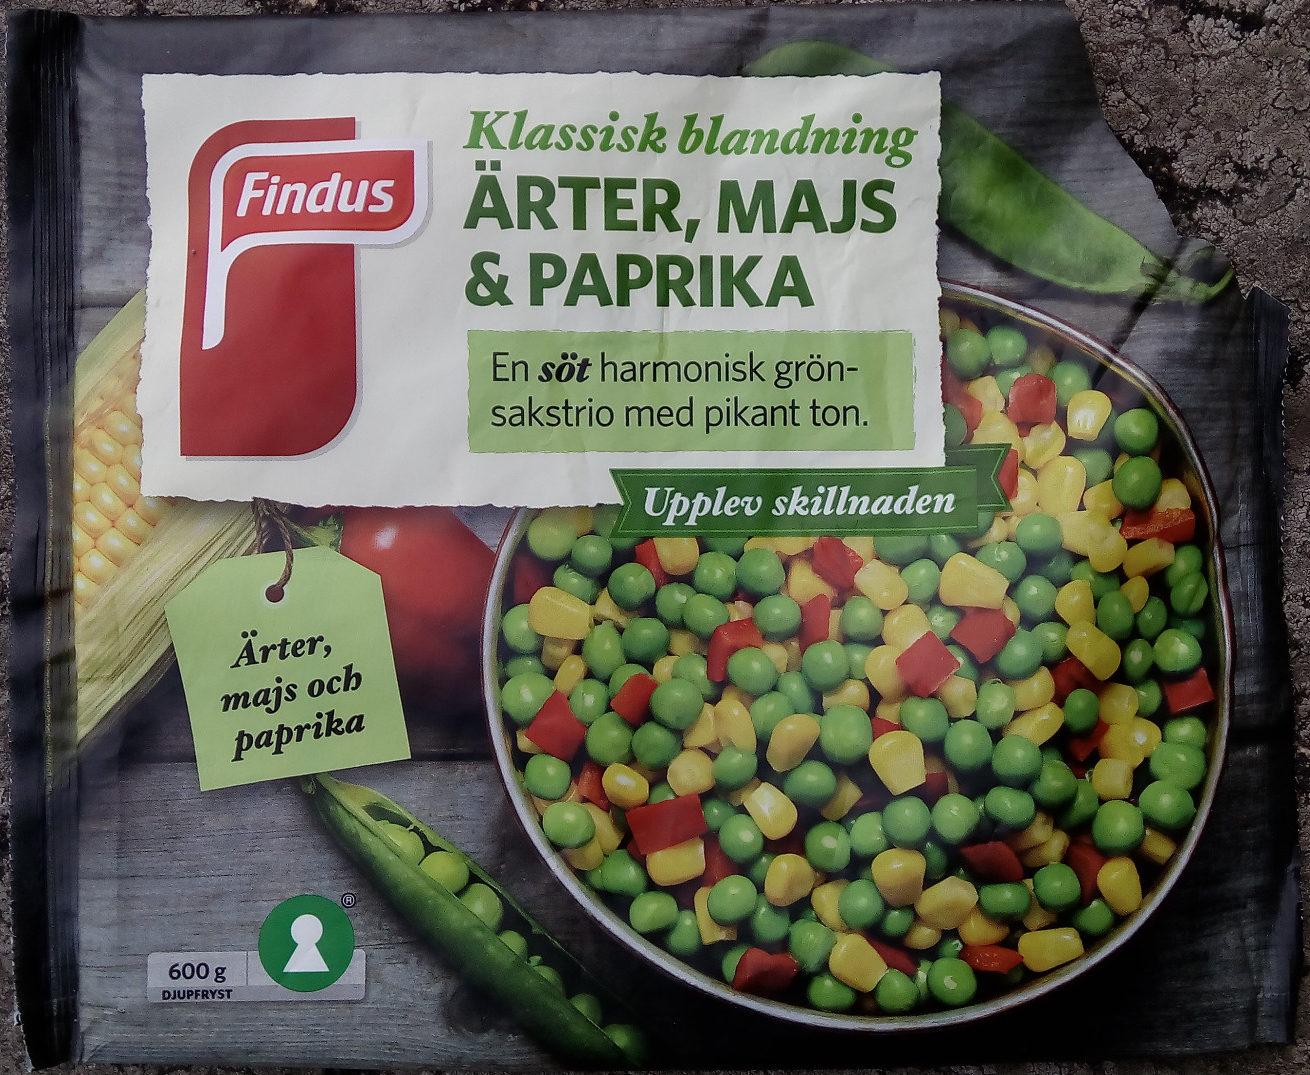 Findus Klassisk blandning Ärter, majs & paprika - Product